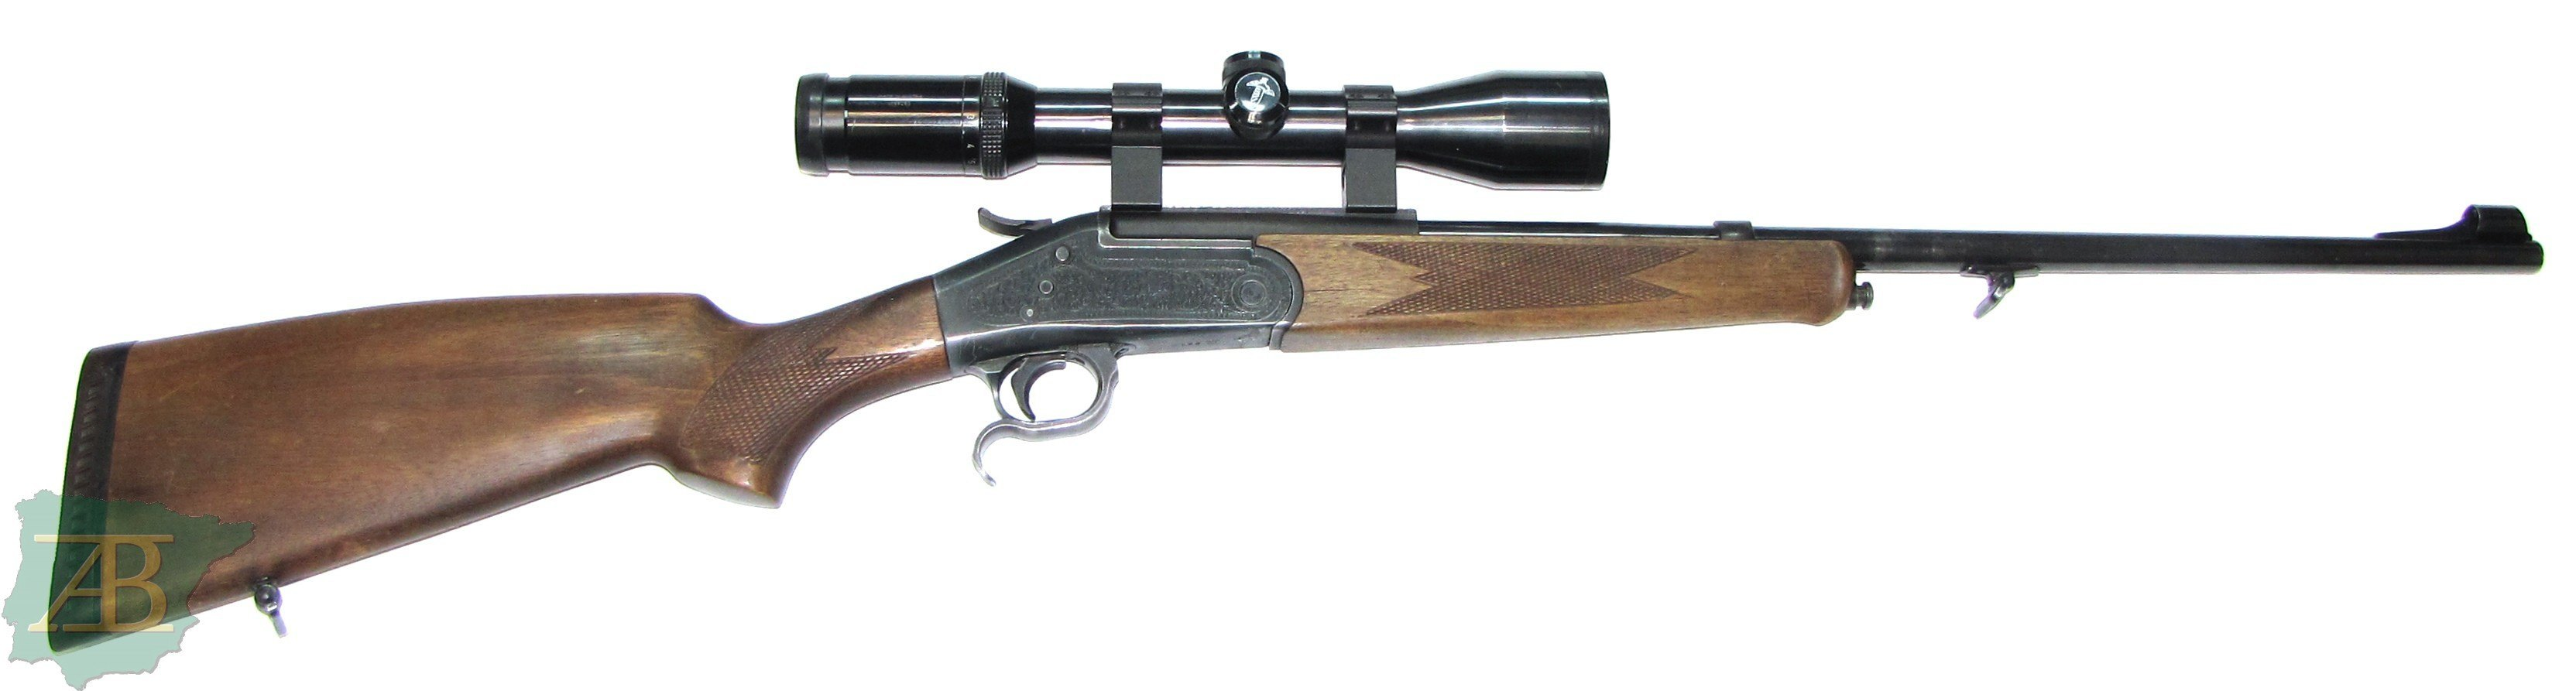 RIFLE MONOTIRO DE CAZA SM 5,6×50 R MAG Ref. 5420